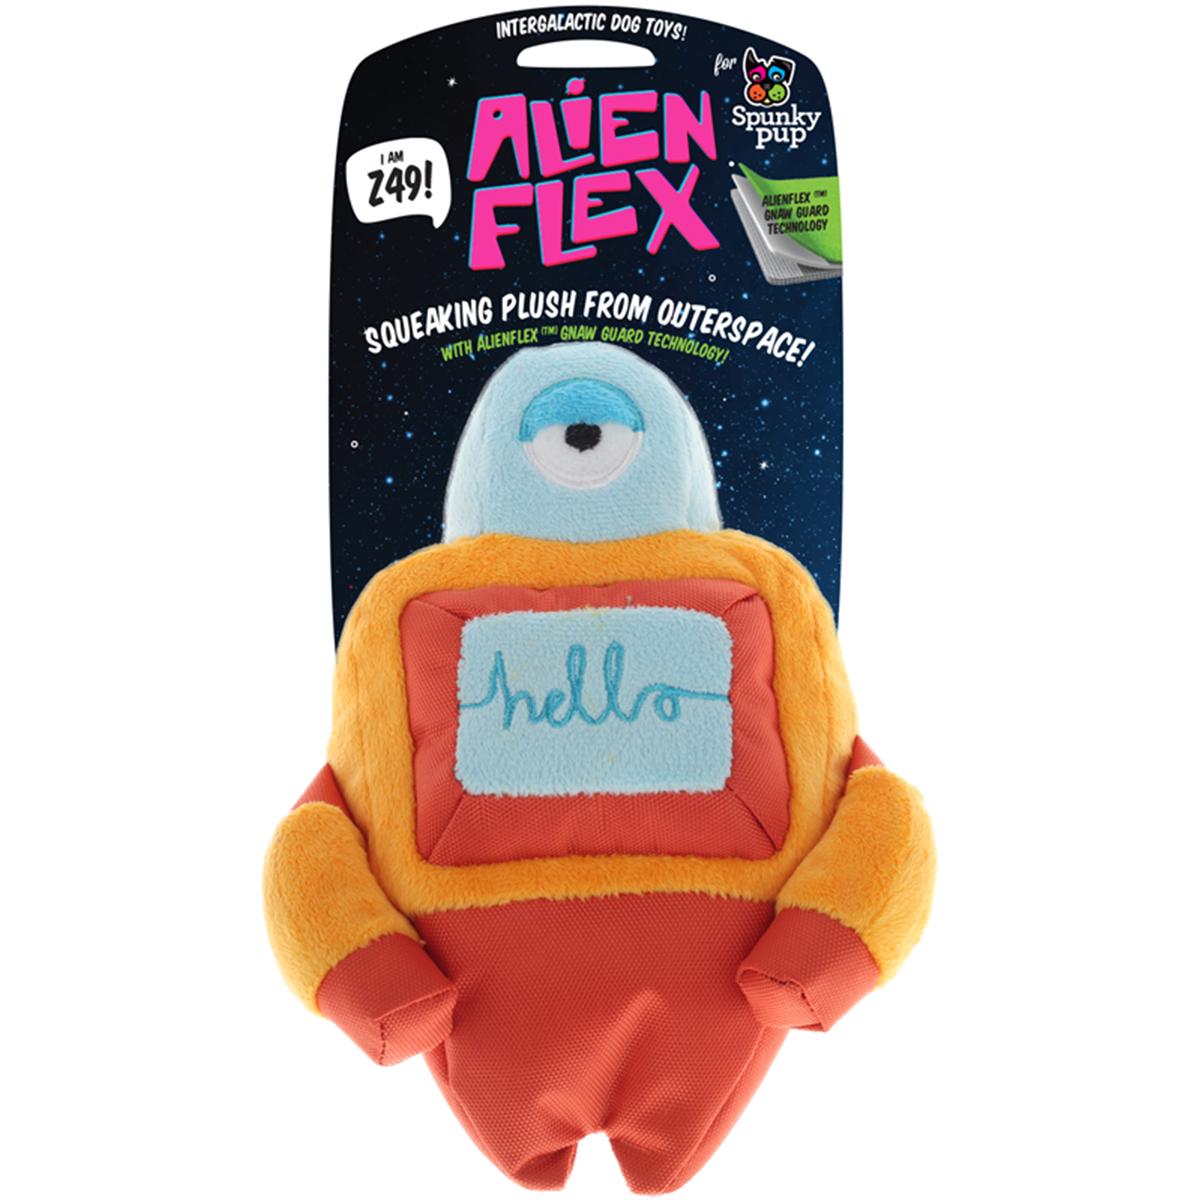 Spunky Pup Alien Flex Plush Toy-Z49